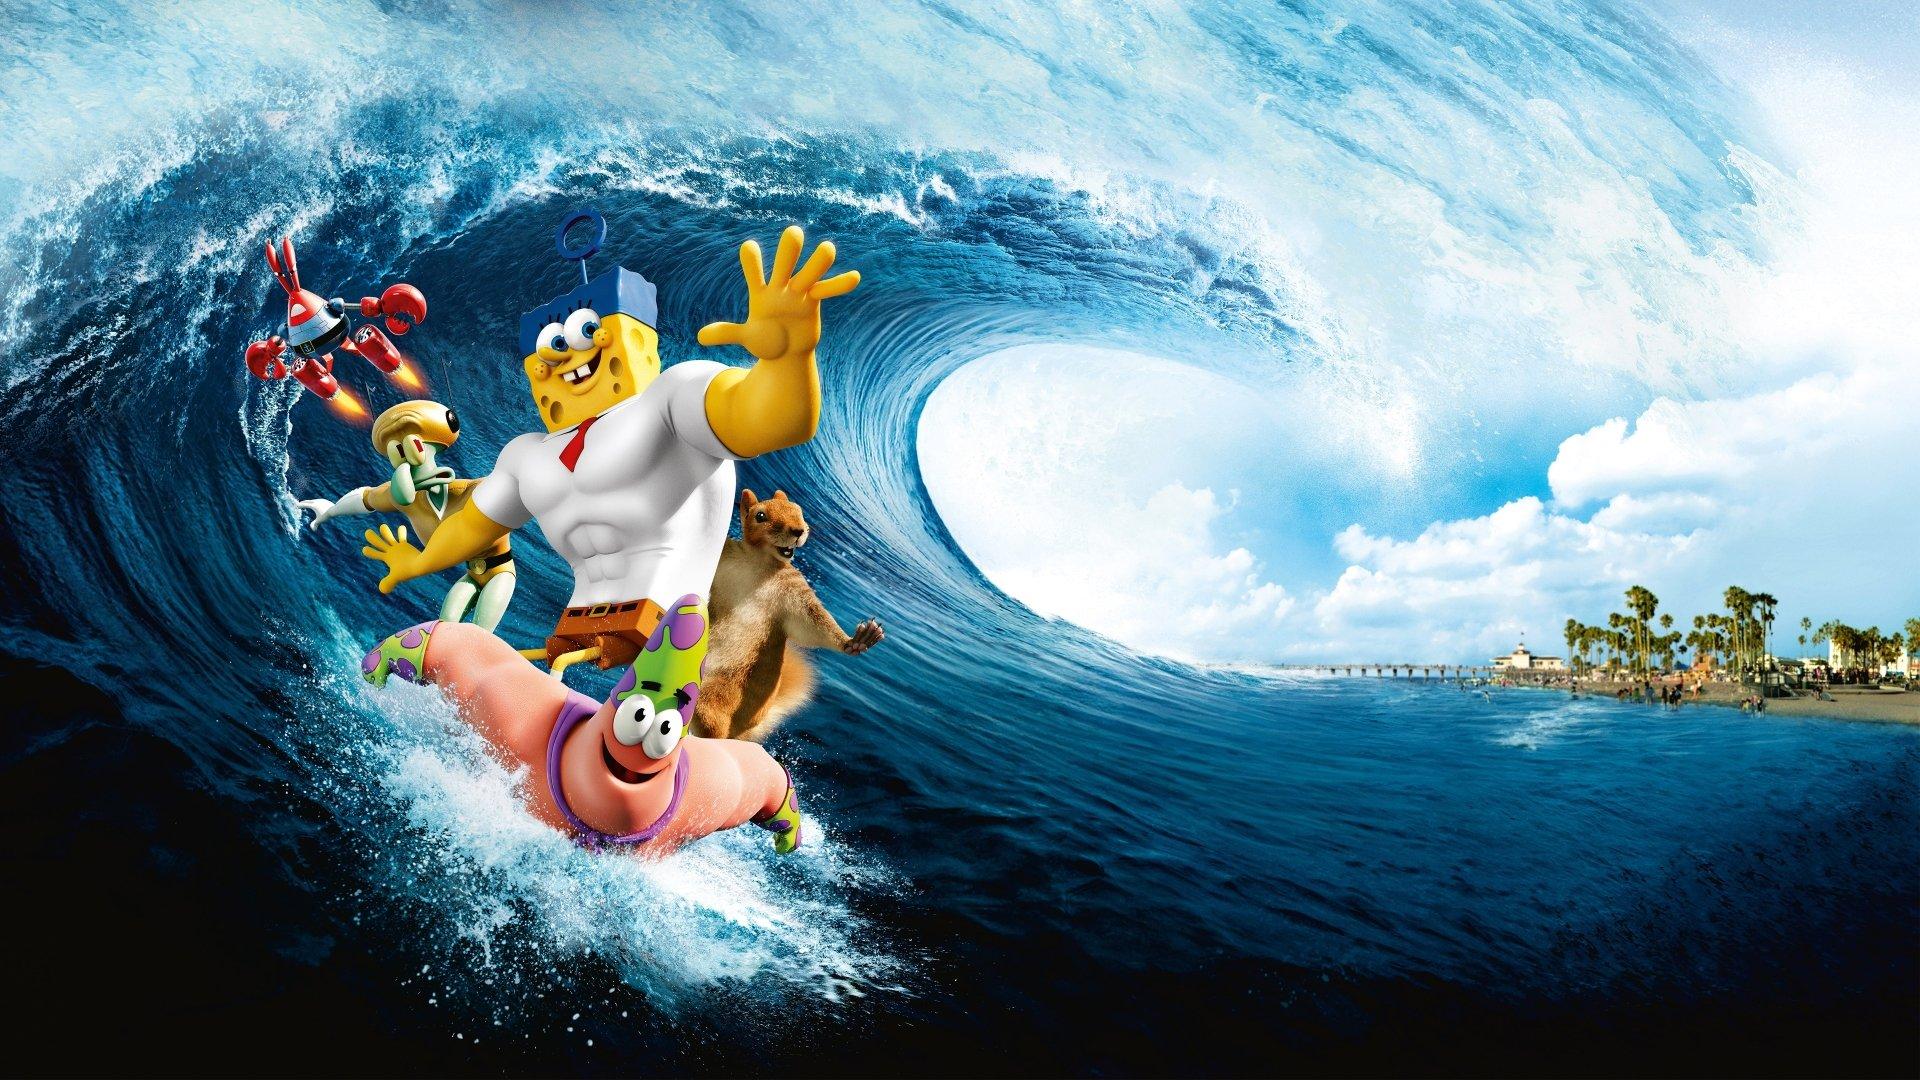 16 The Spongebob Movie Sponge Out Of Water Hd Wallpapers